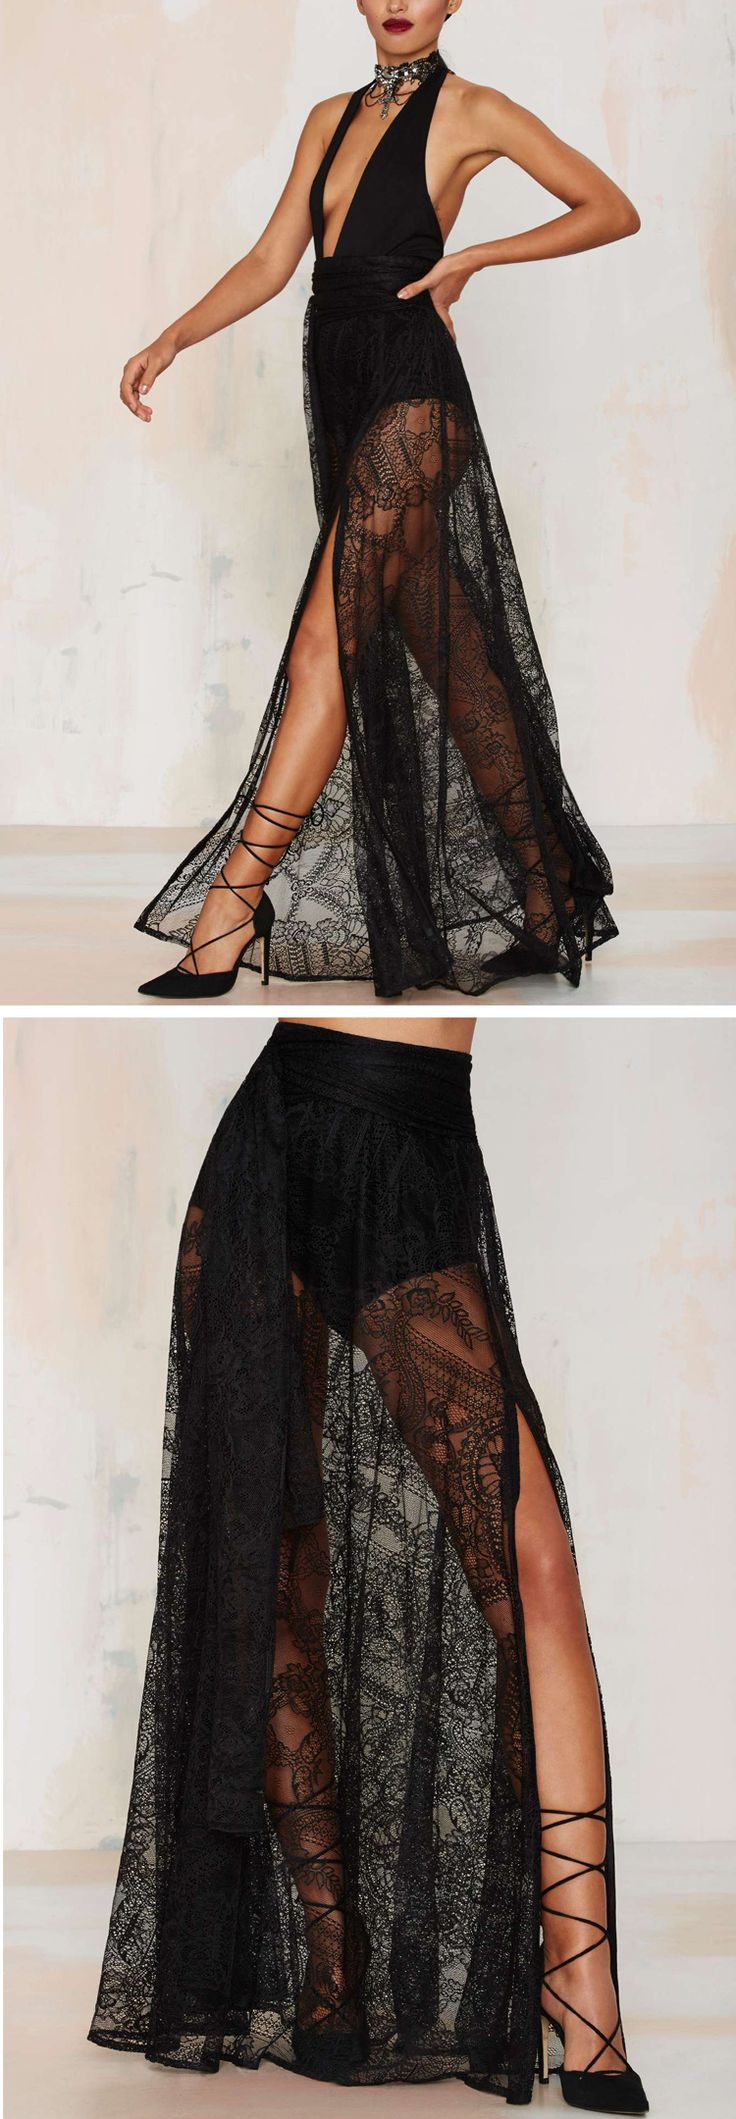 Daring sheer lace maxi skirt | Style | Pinterest | Maxi ...